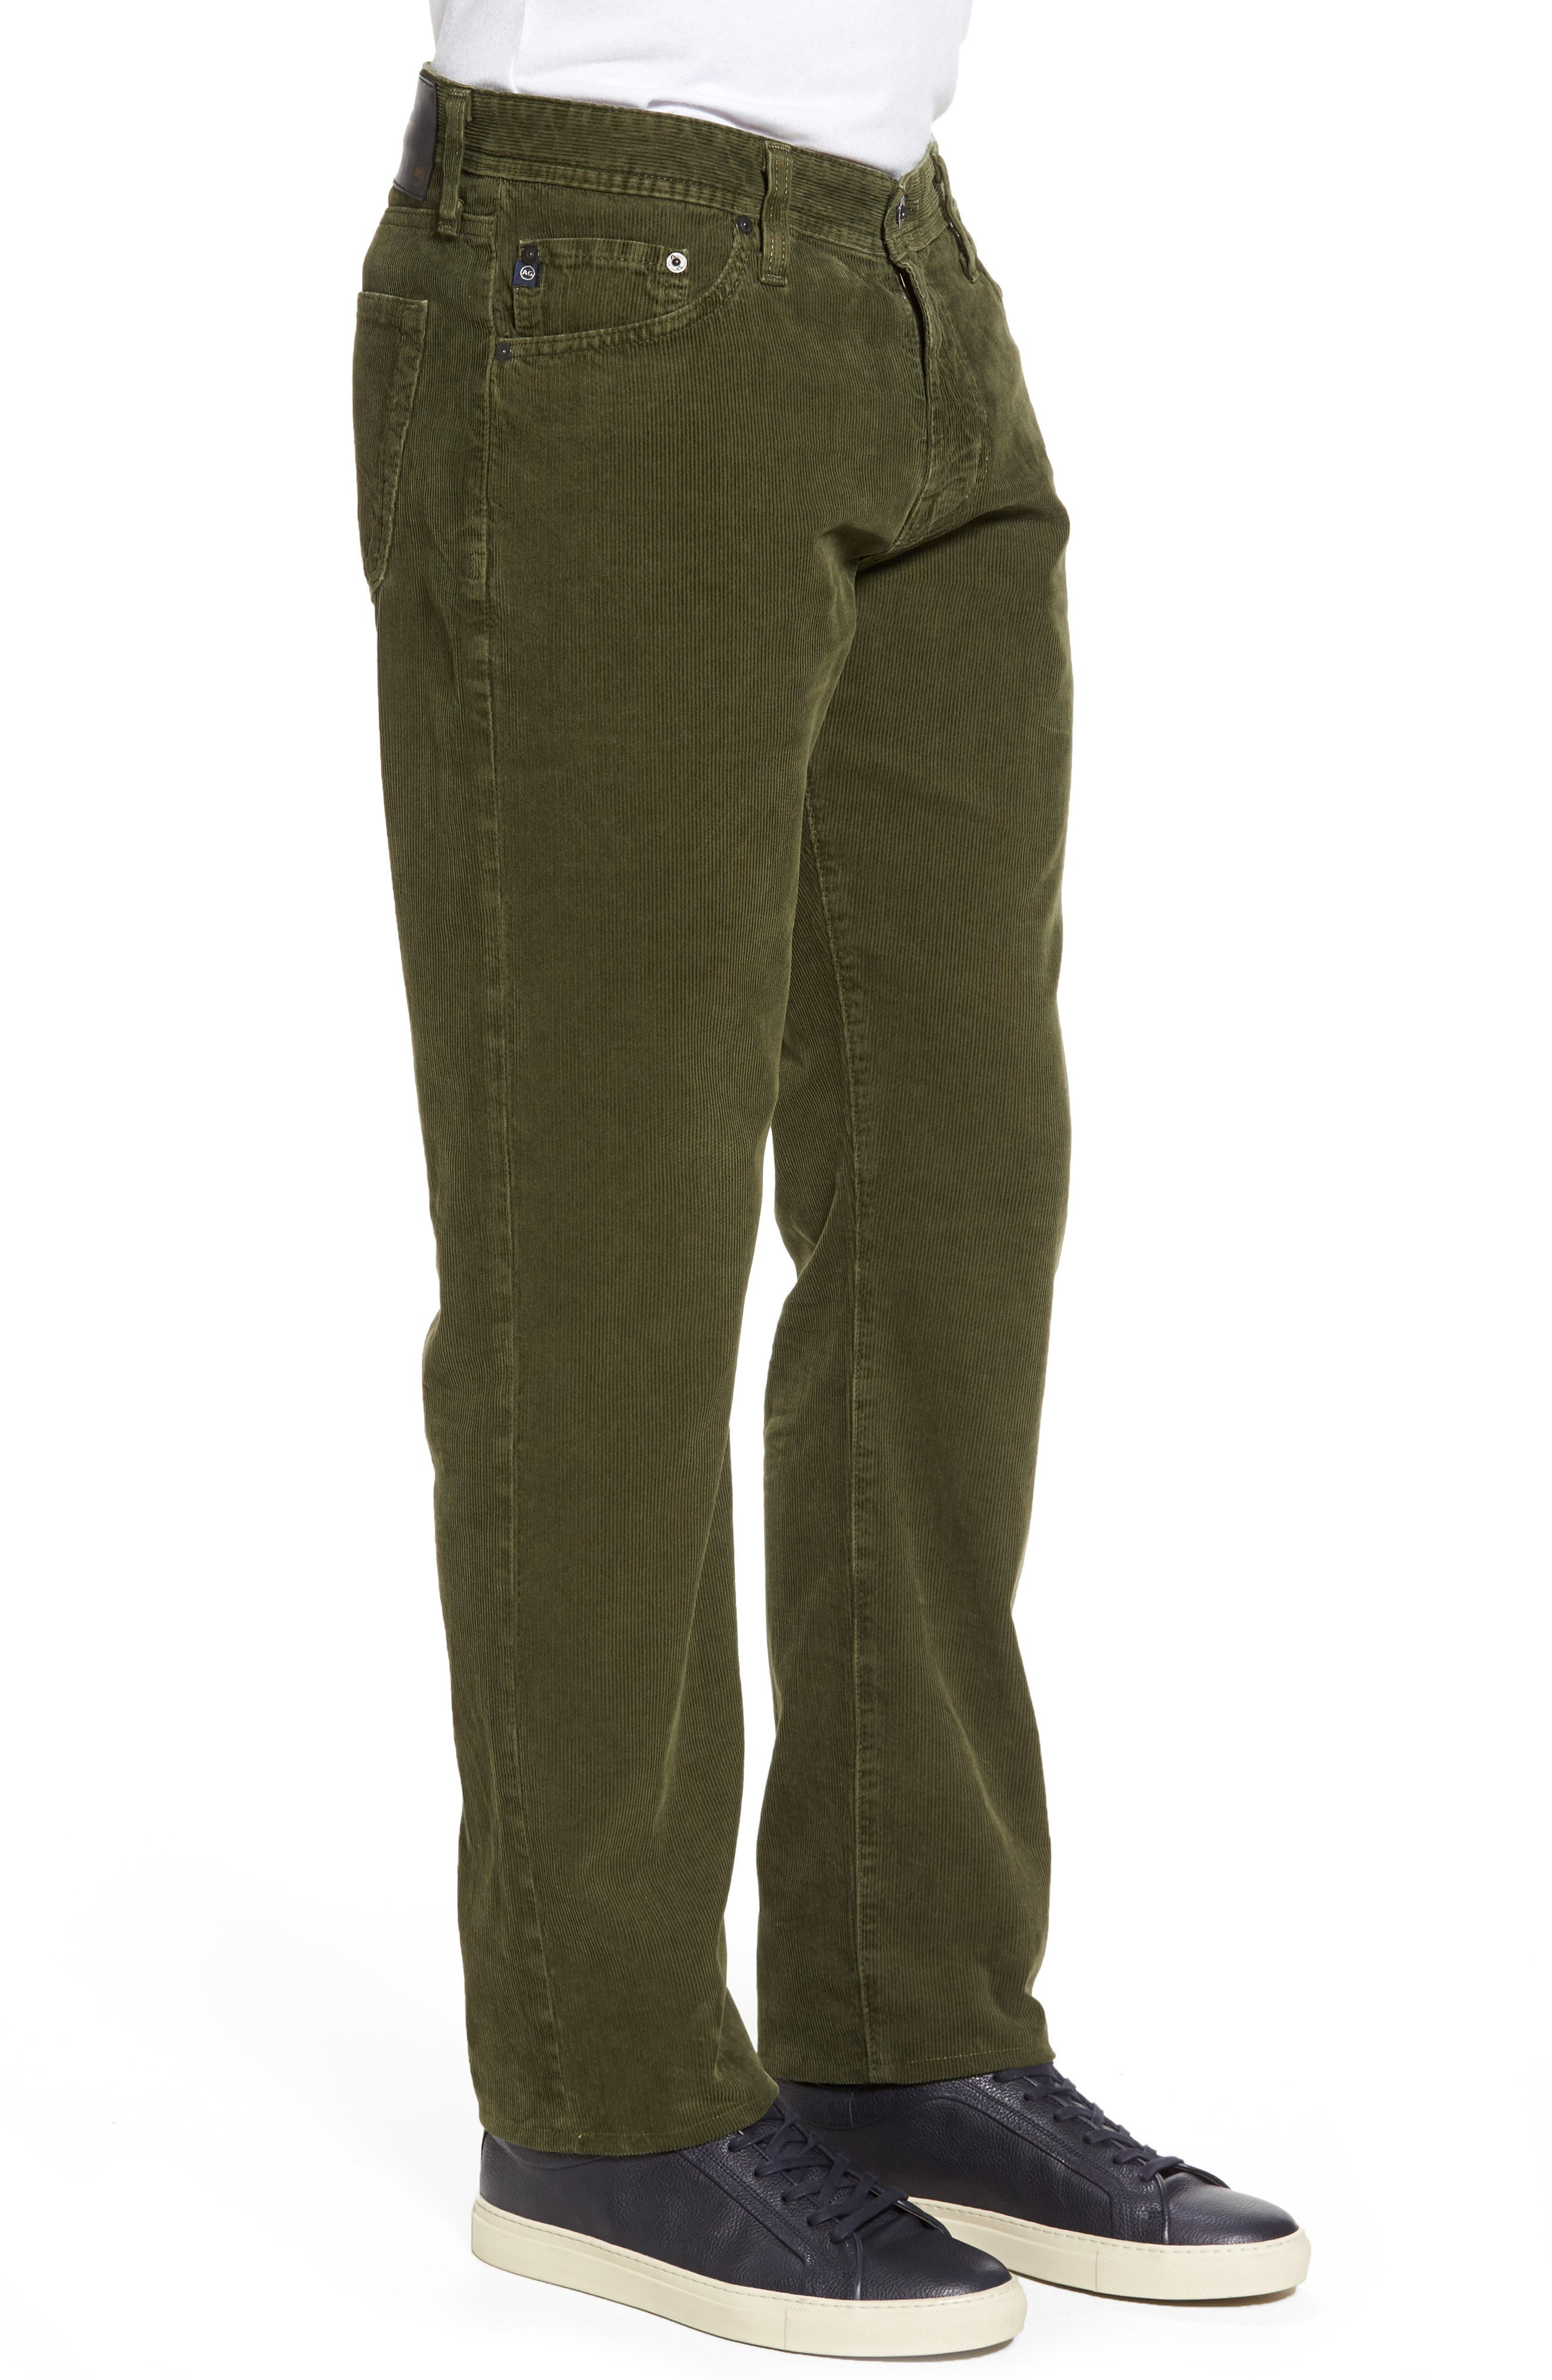 'Graduate' Tailored Straight Leg Corduroy Pants,                             Alternate thumbnail 3, color,                             Sulfur Climbing Ivy